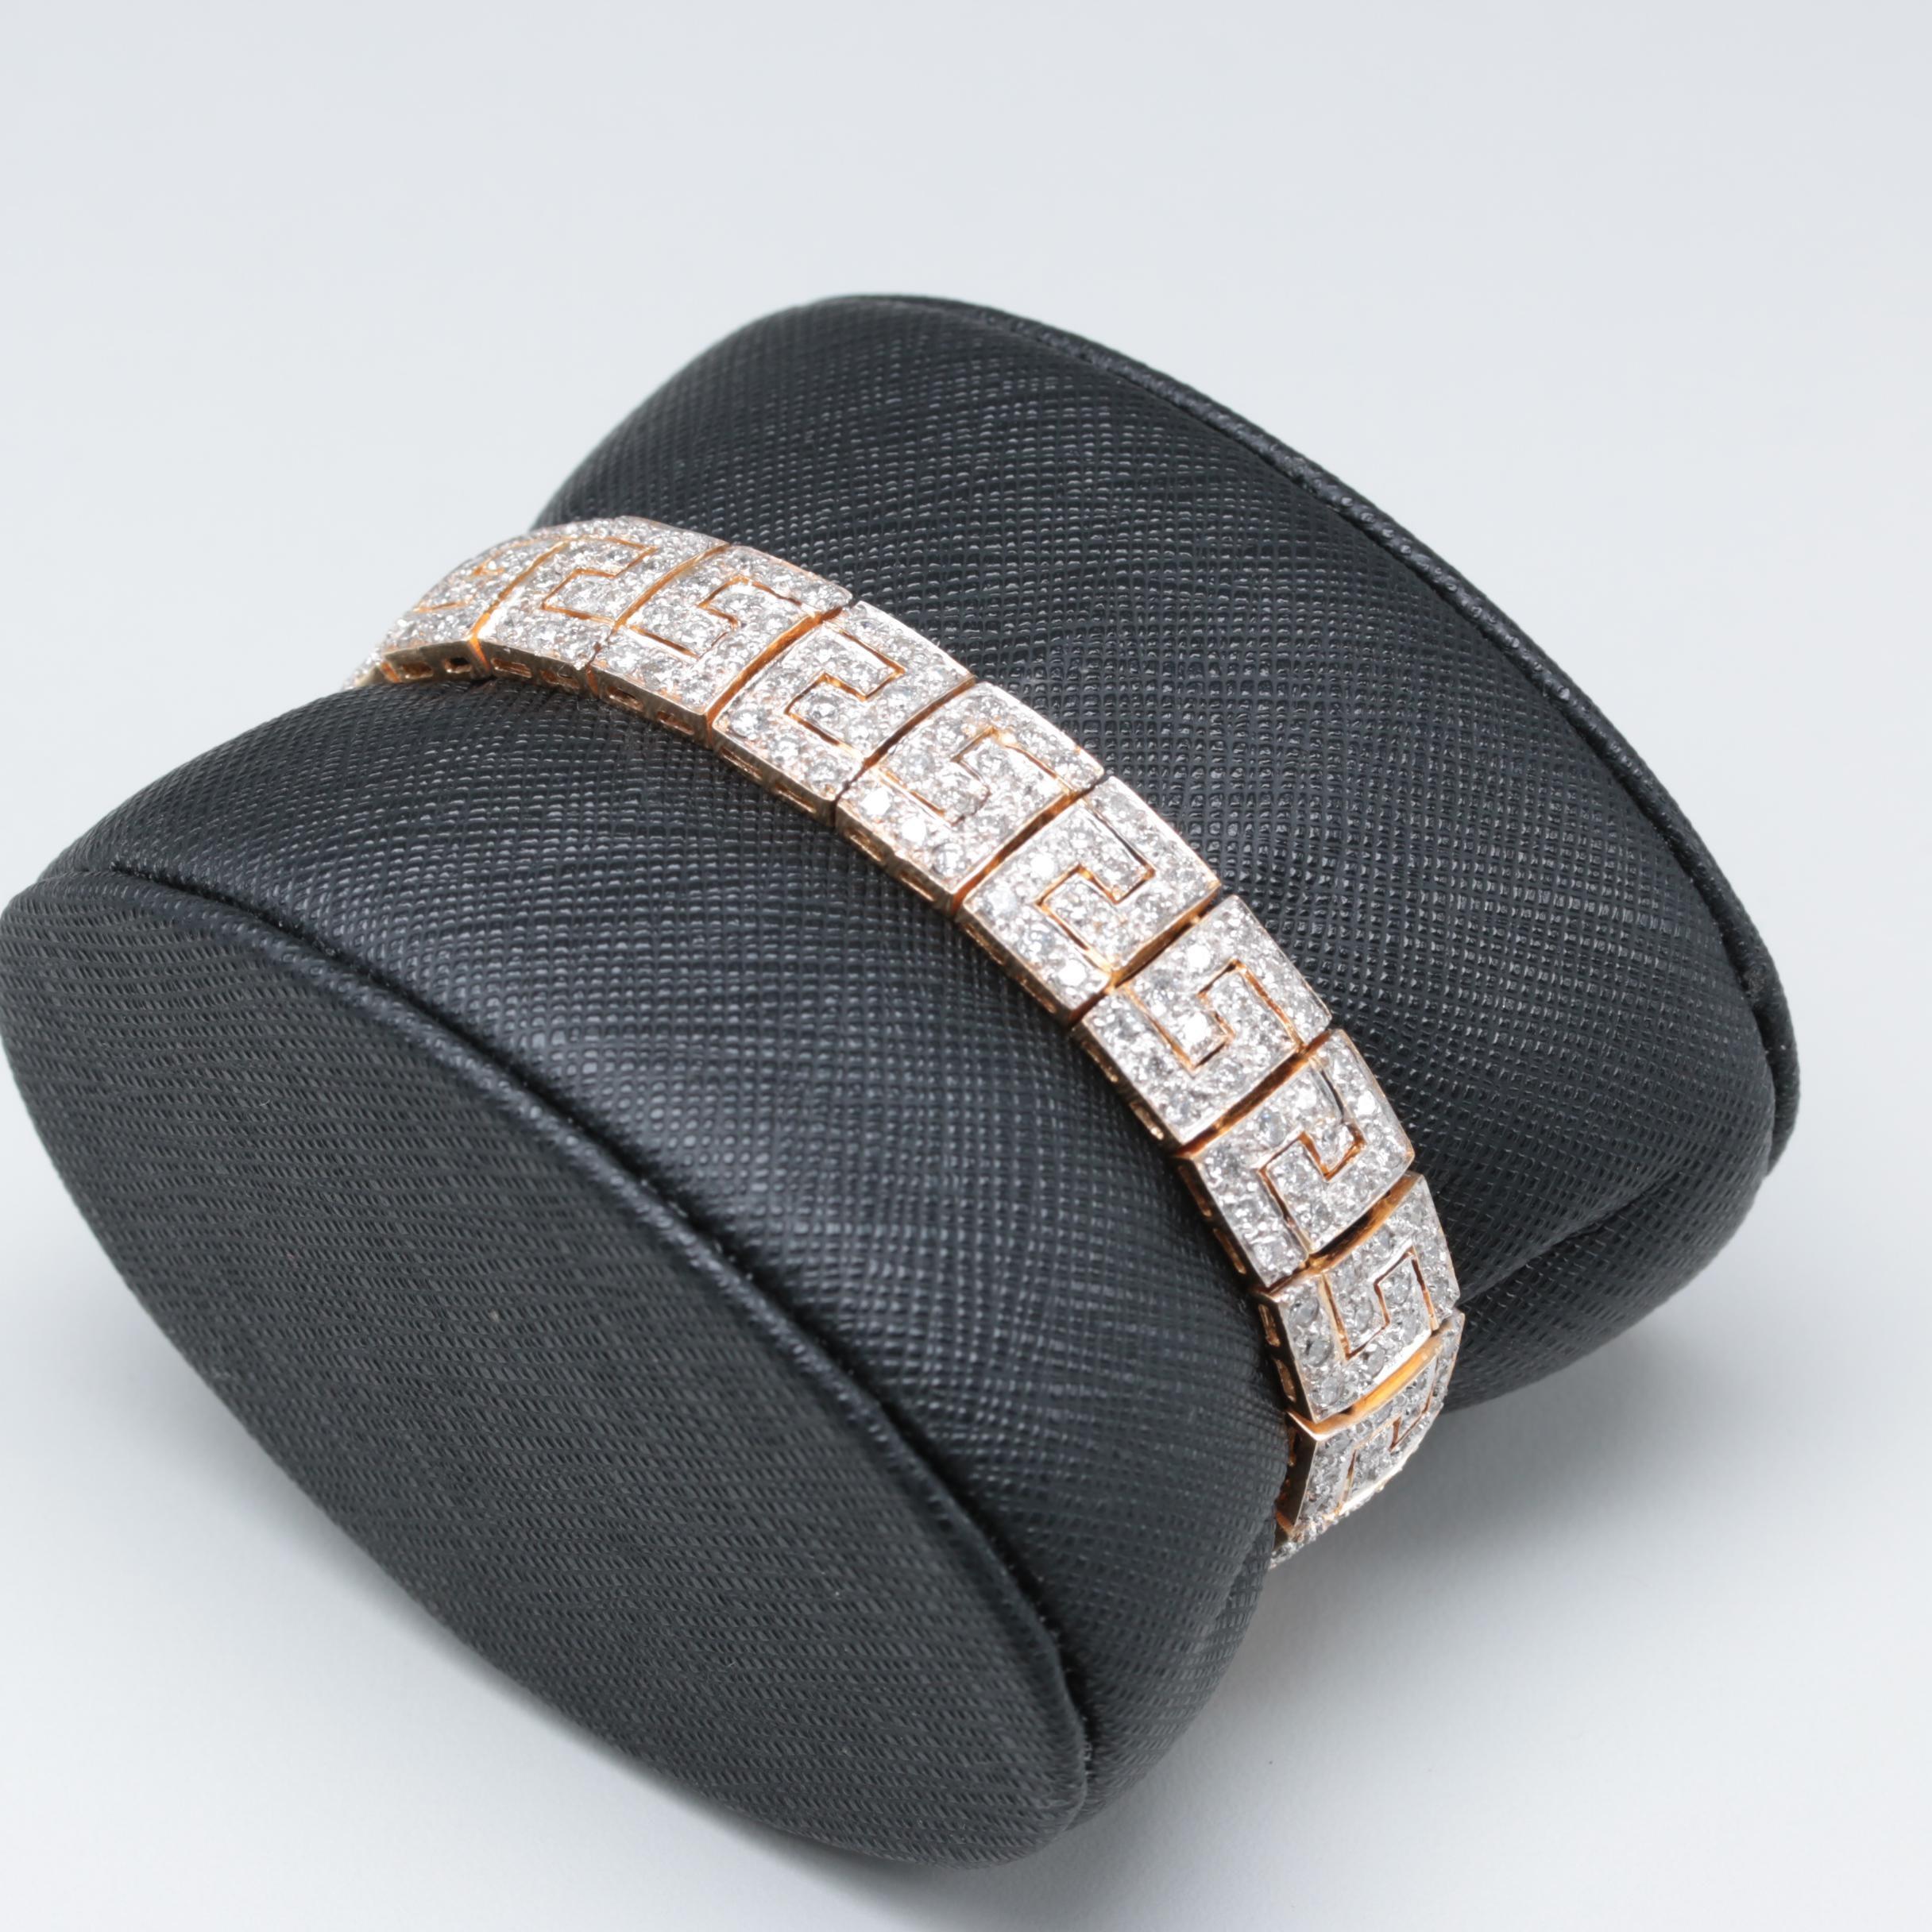 14K Yellow Gold 5.25 CTW Diamond Bracelet